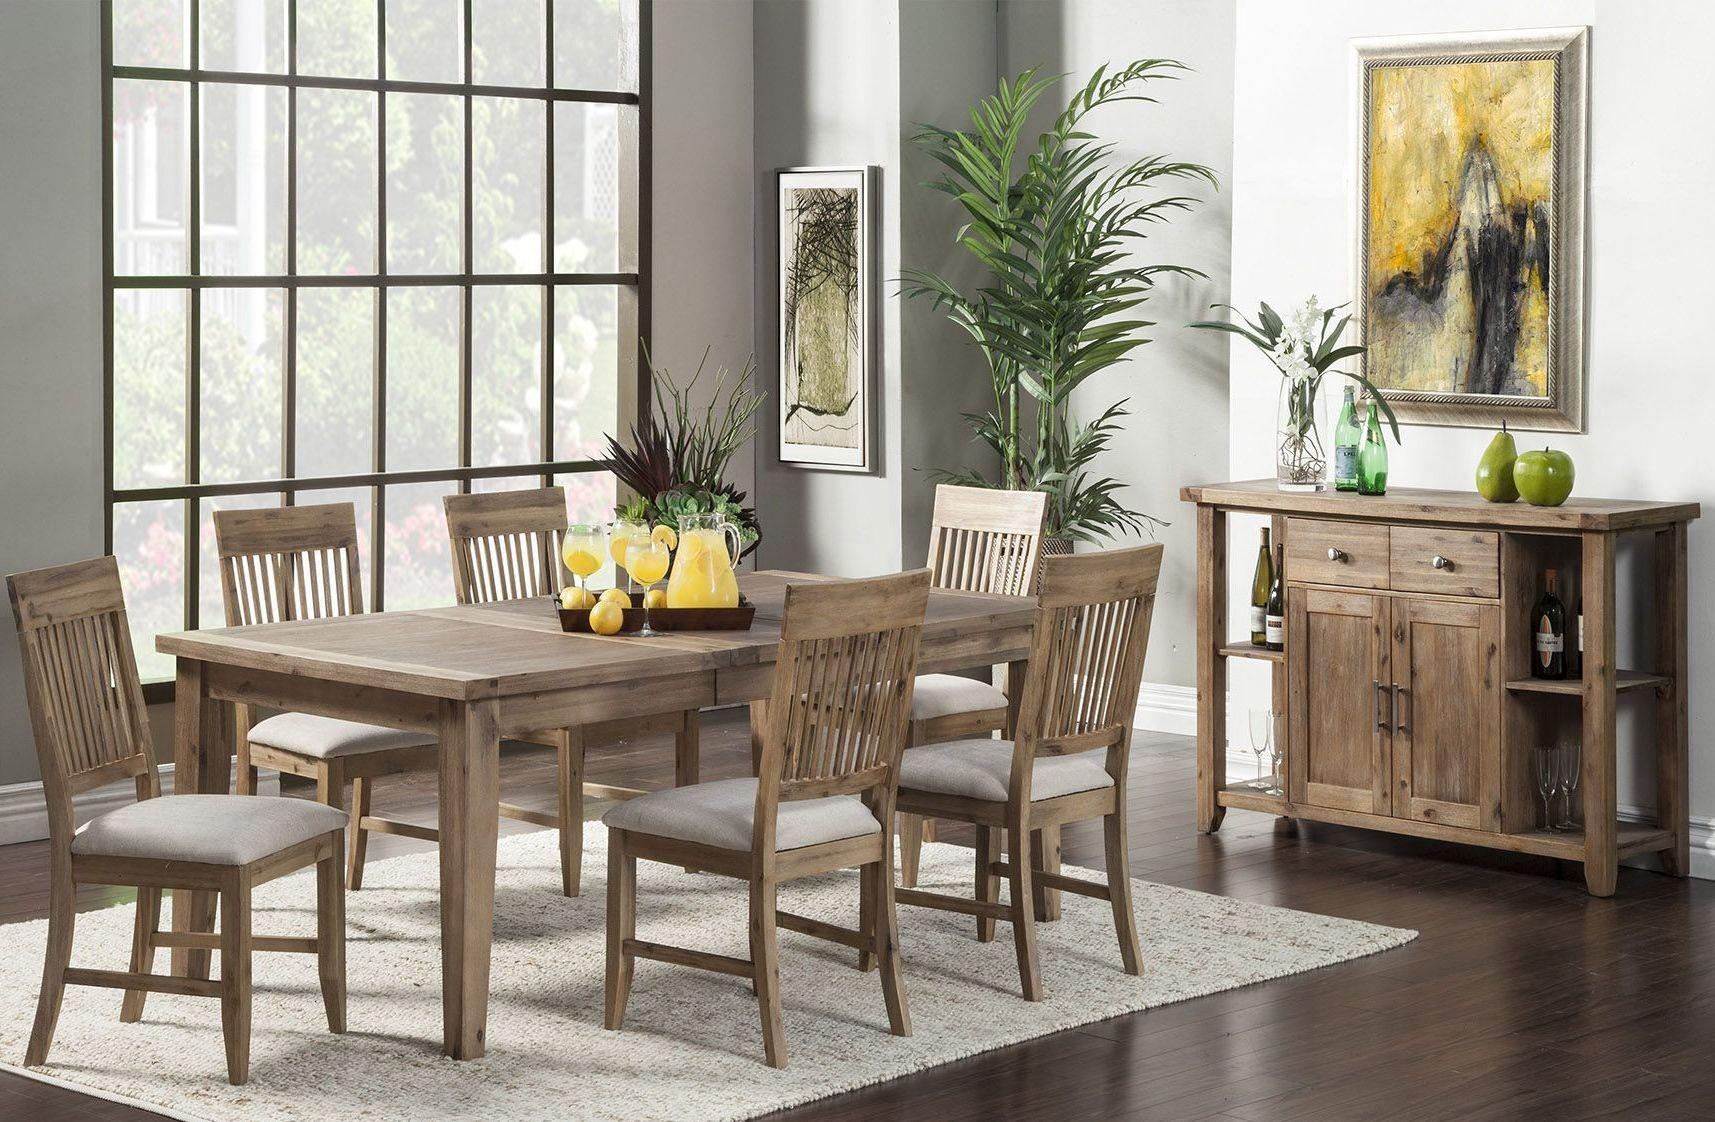 aspen natural extendable dining room set 2524558 alpine